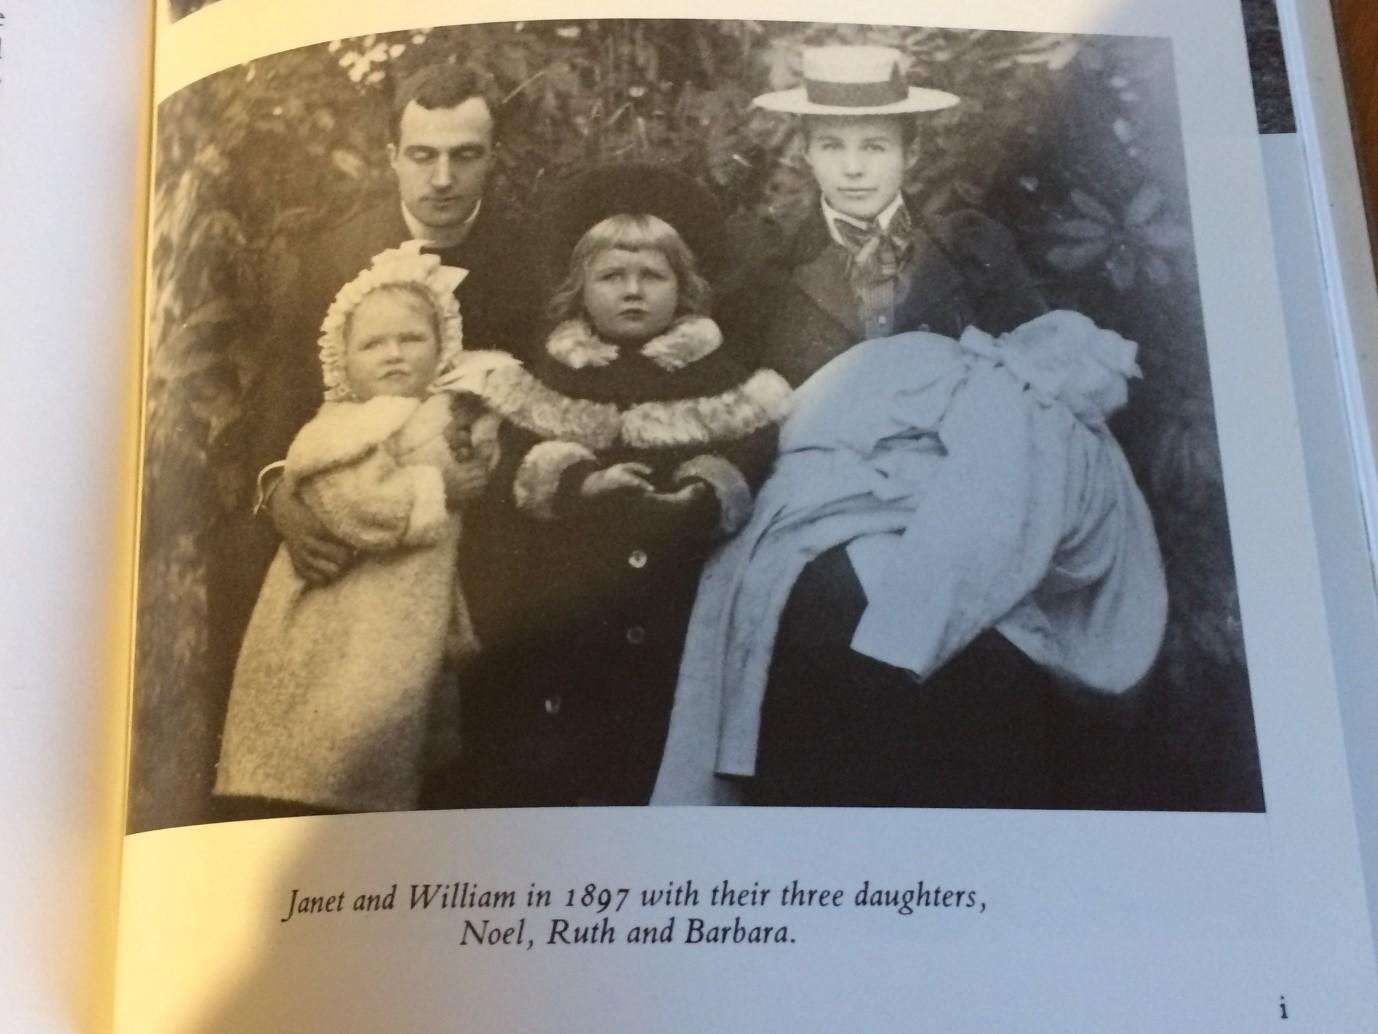 The Streatfeild family in 1897